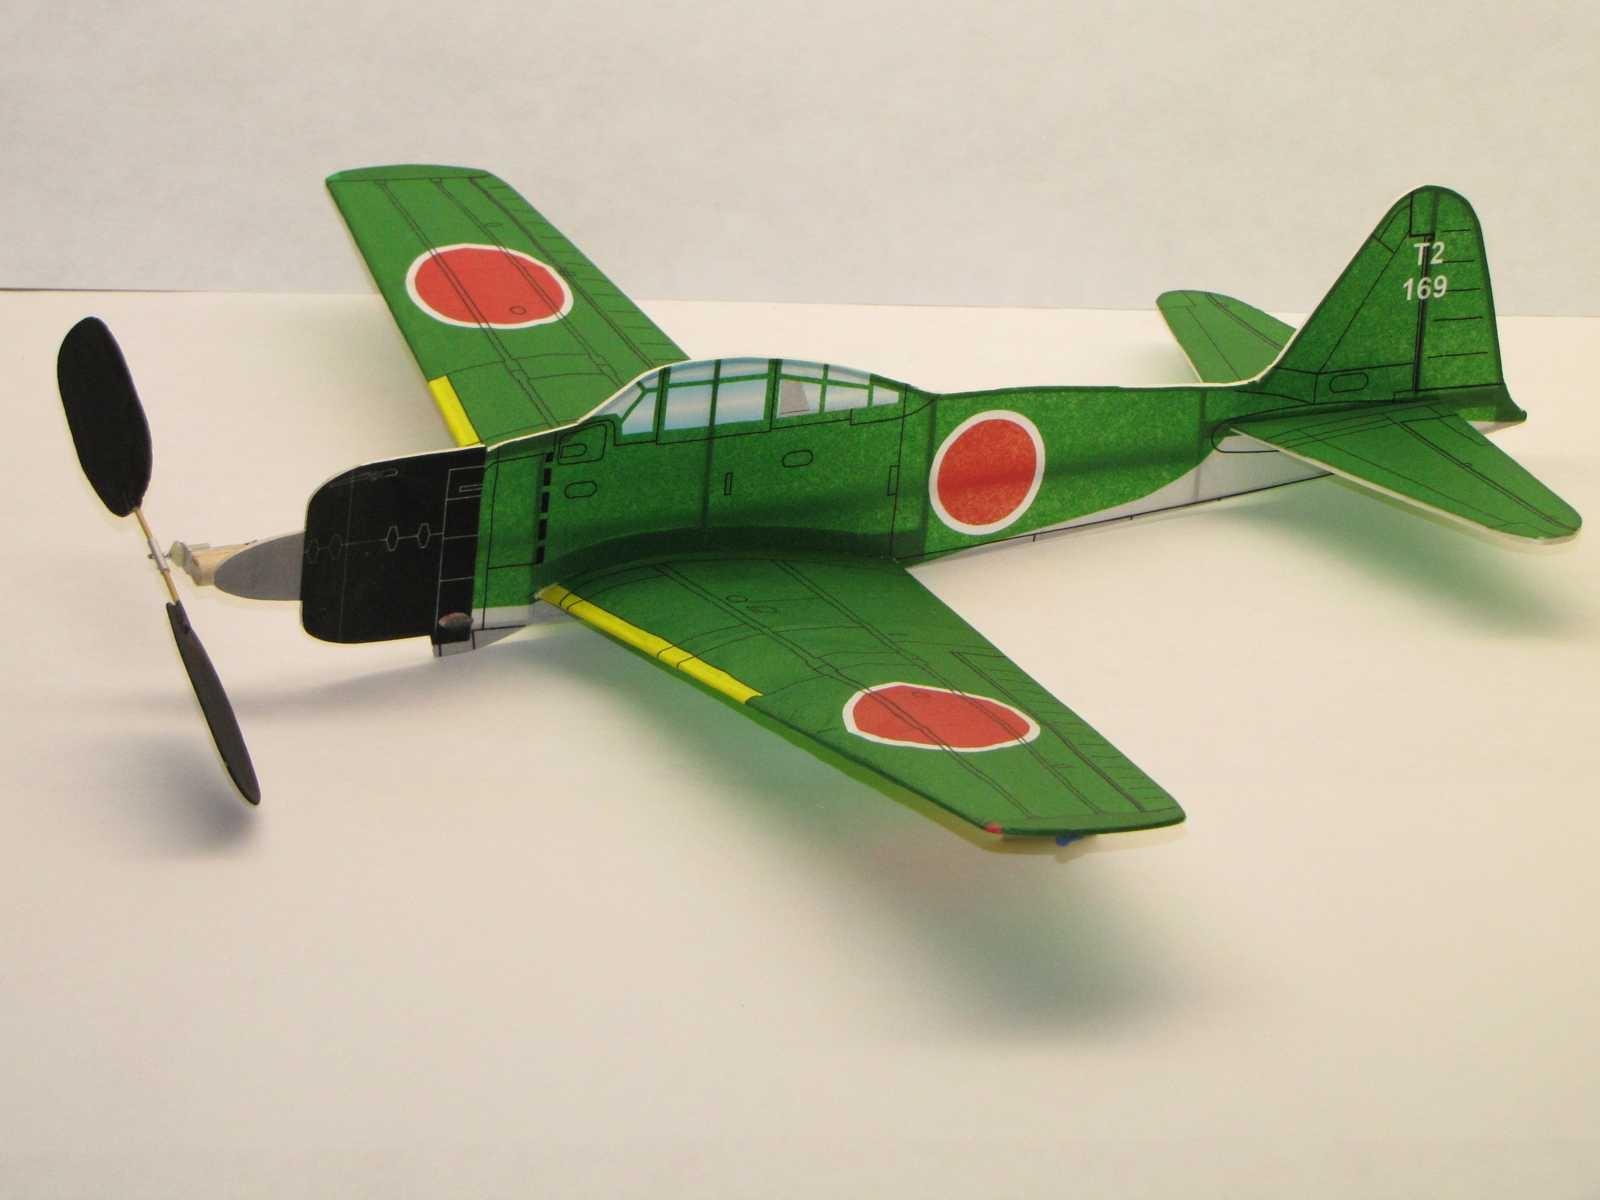 paul and ralph bradley s model airplane hangout free flight models